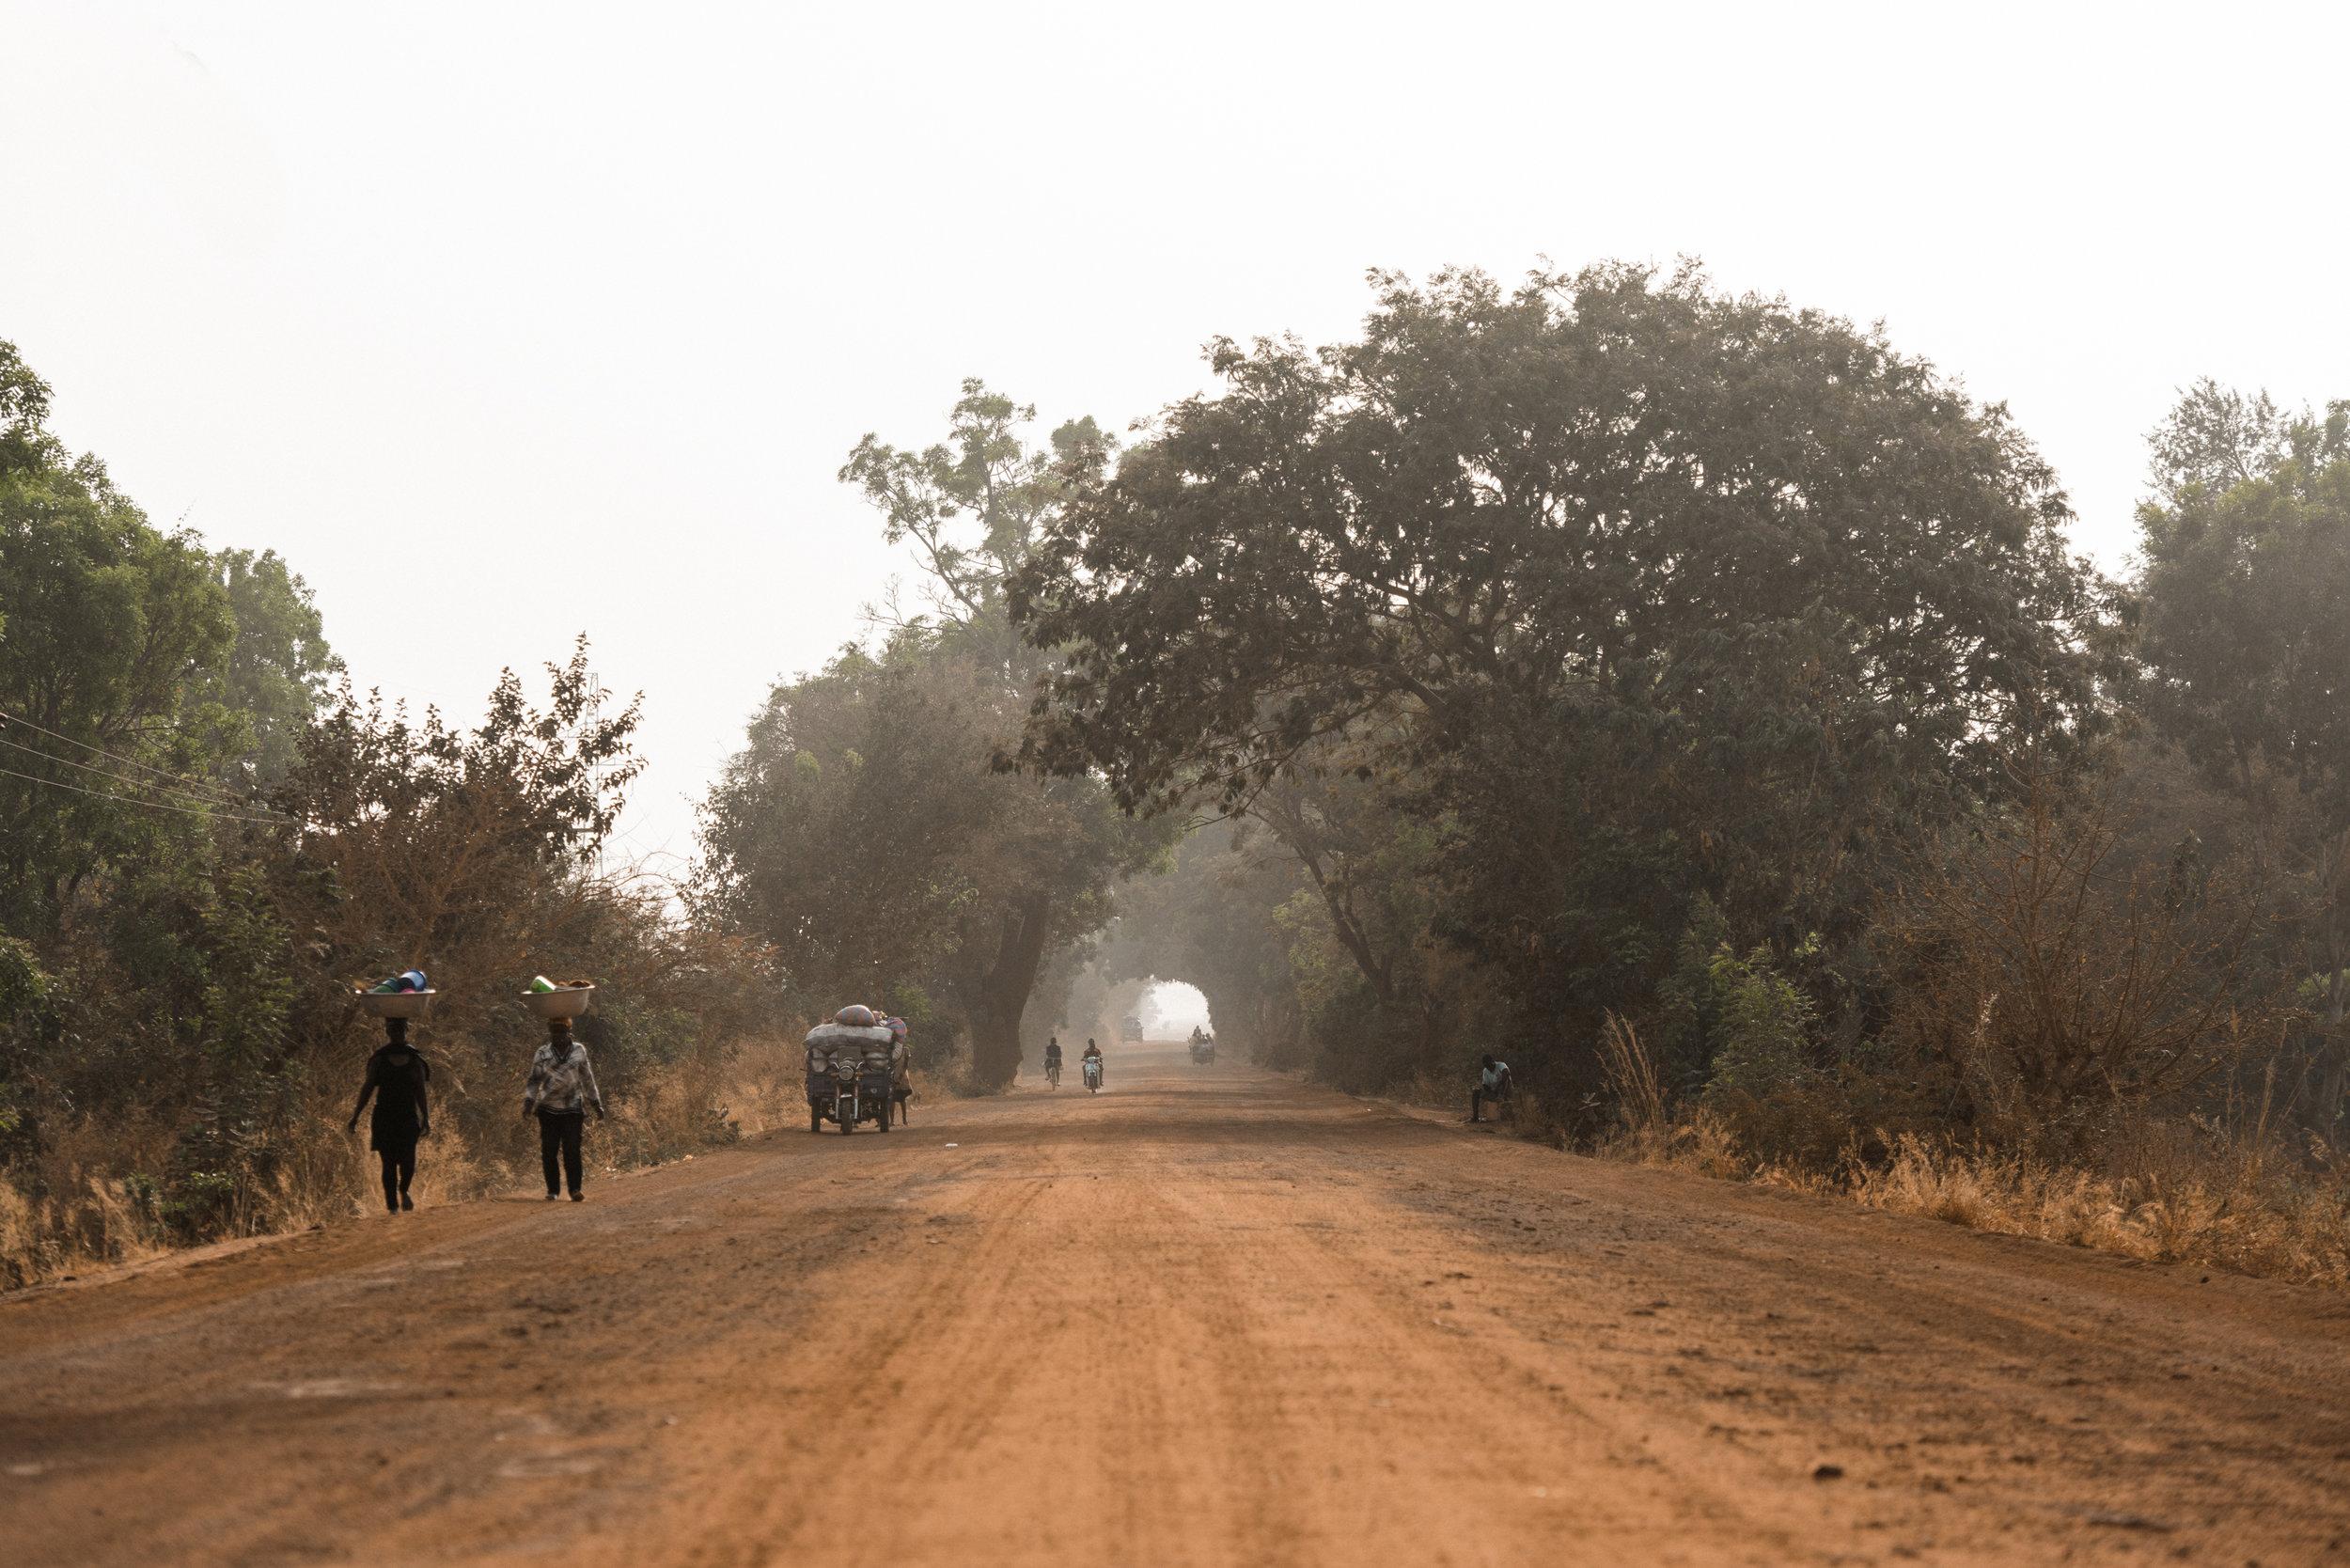 TaraShupe_HumanitarianPhotographer_Woman_Photographer_National_Geographic_Ghana_Women_015.jpg